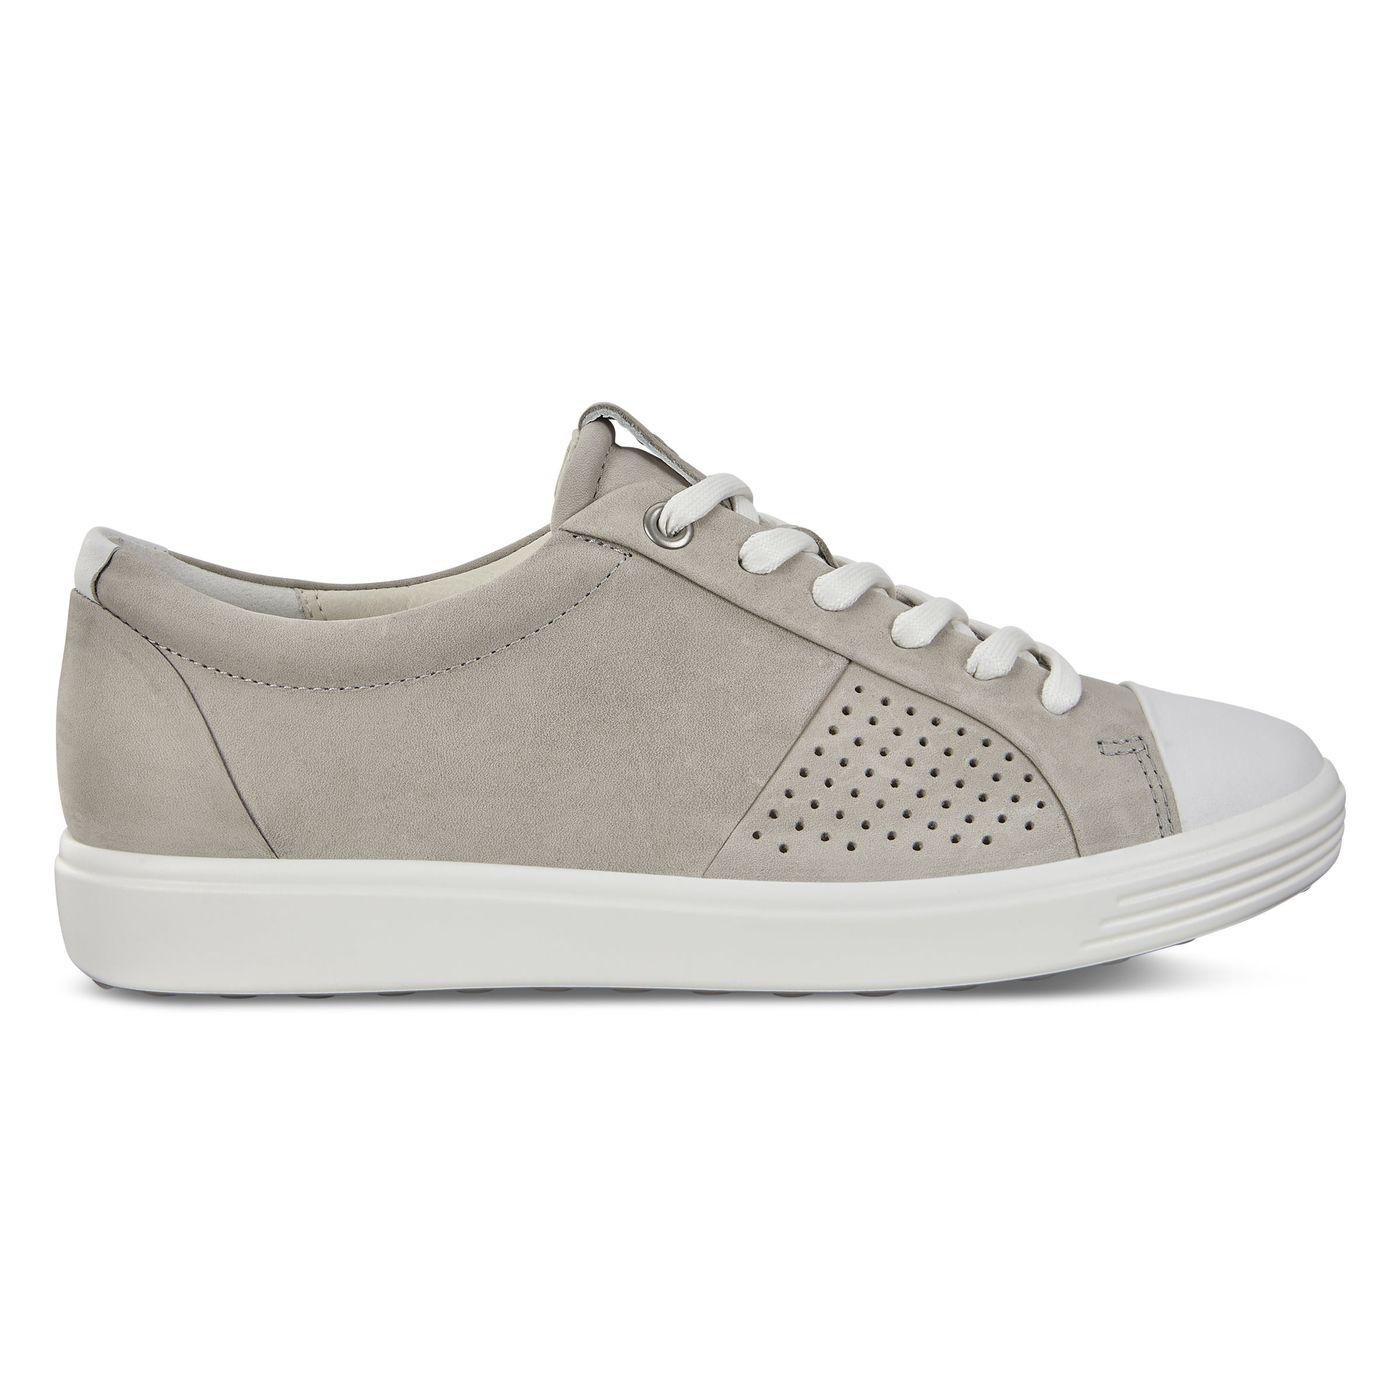 Nubuck Leather Shoe | ECCO® Shoes